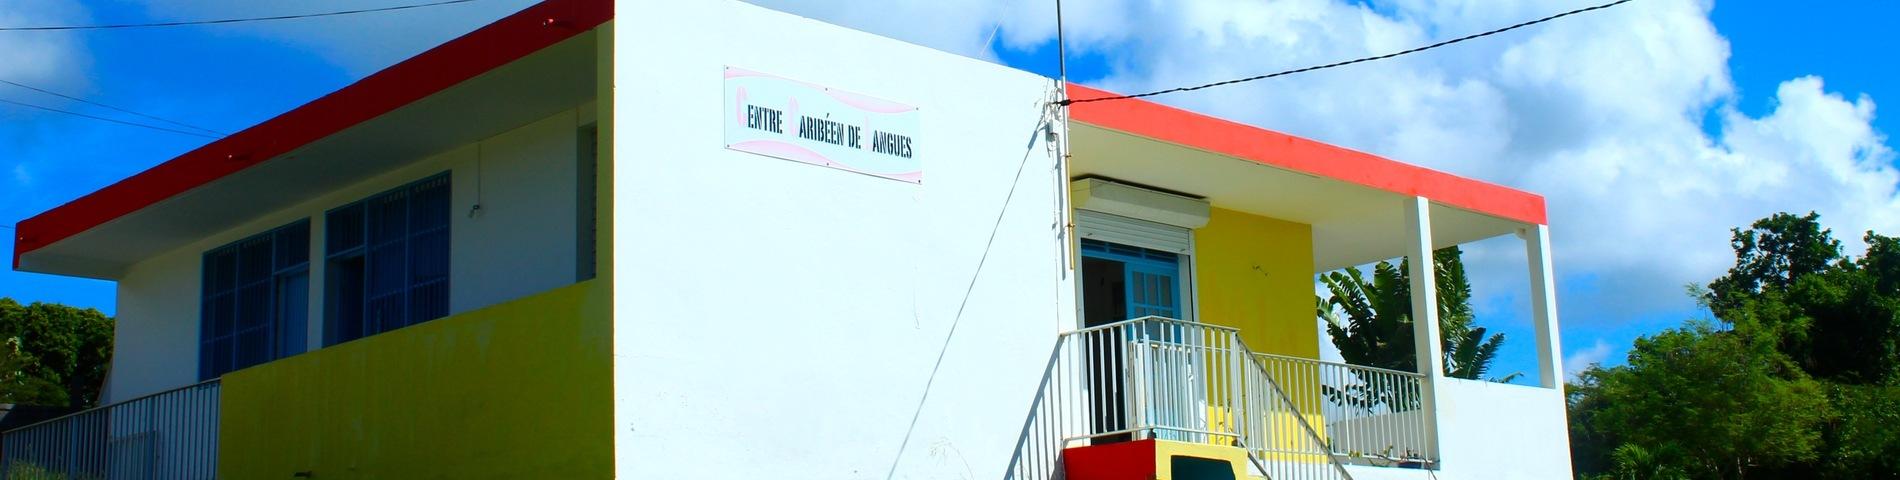 Imagen 1 de la escuela Centre Caribéen de Langues